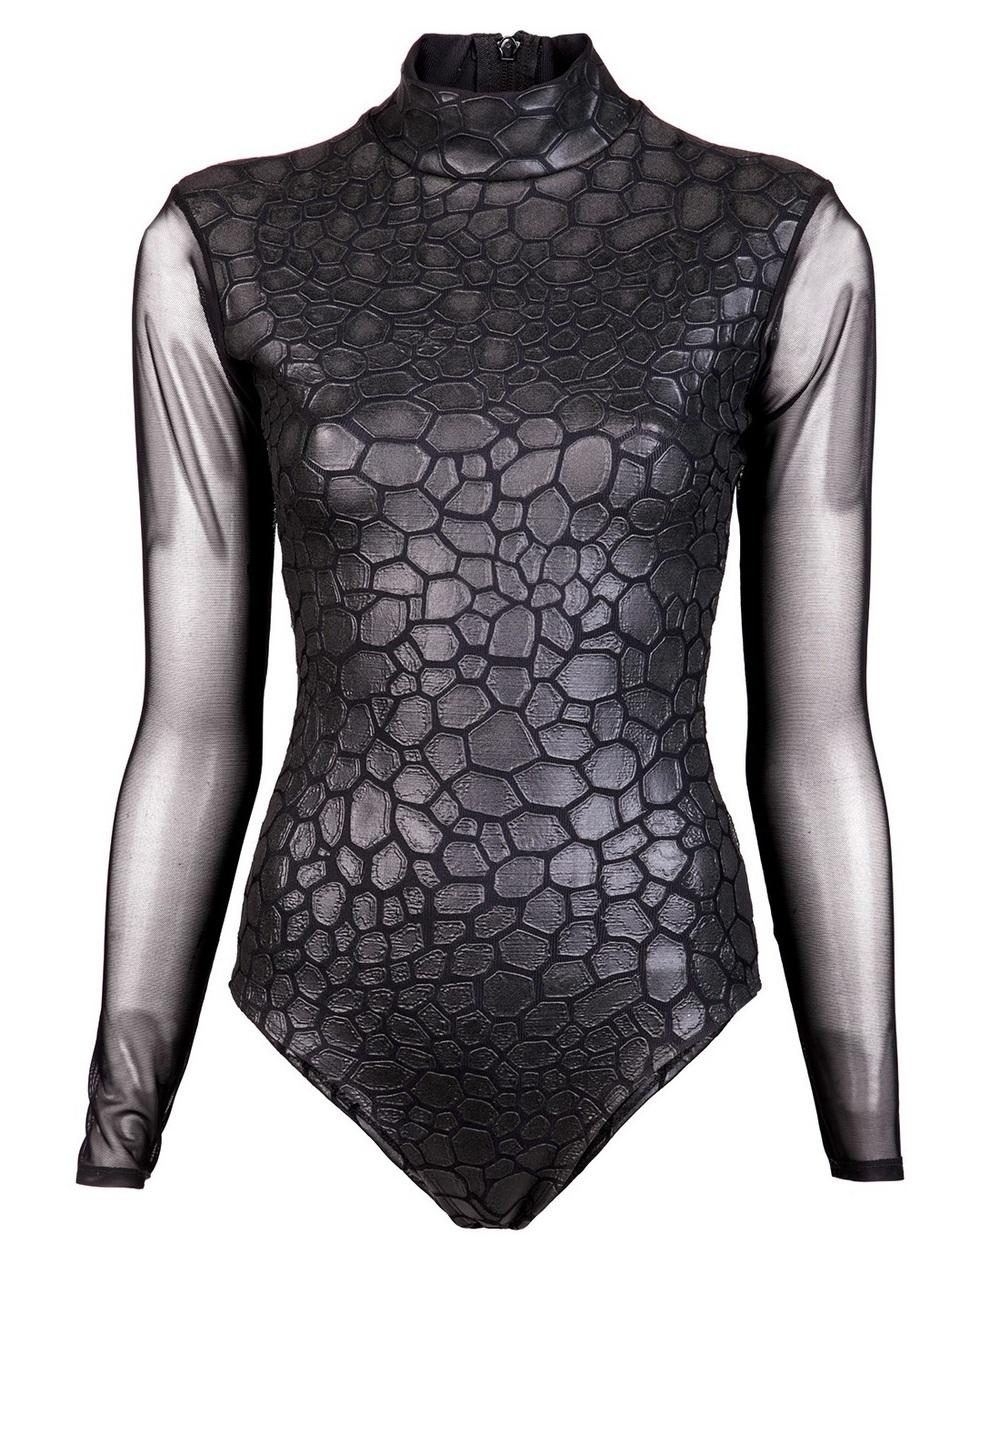 Mesh Body Suit